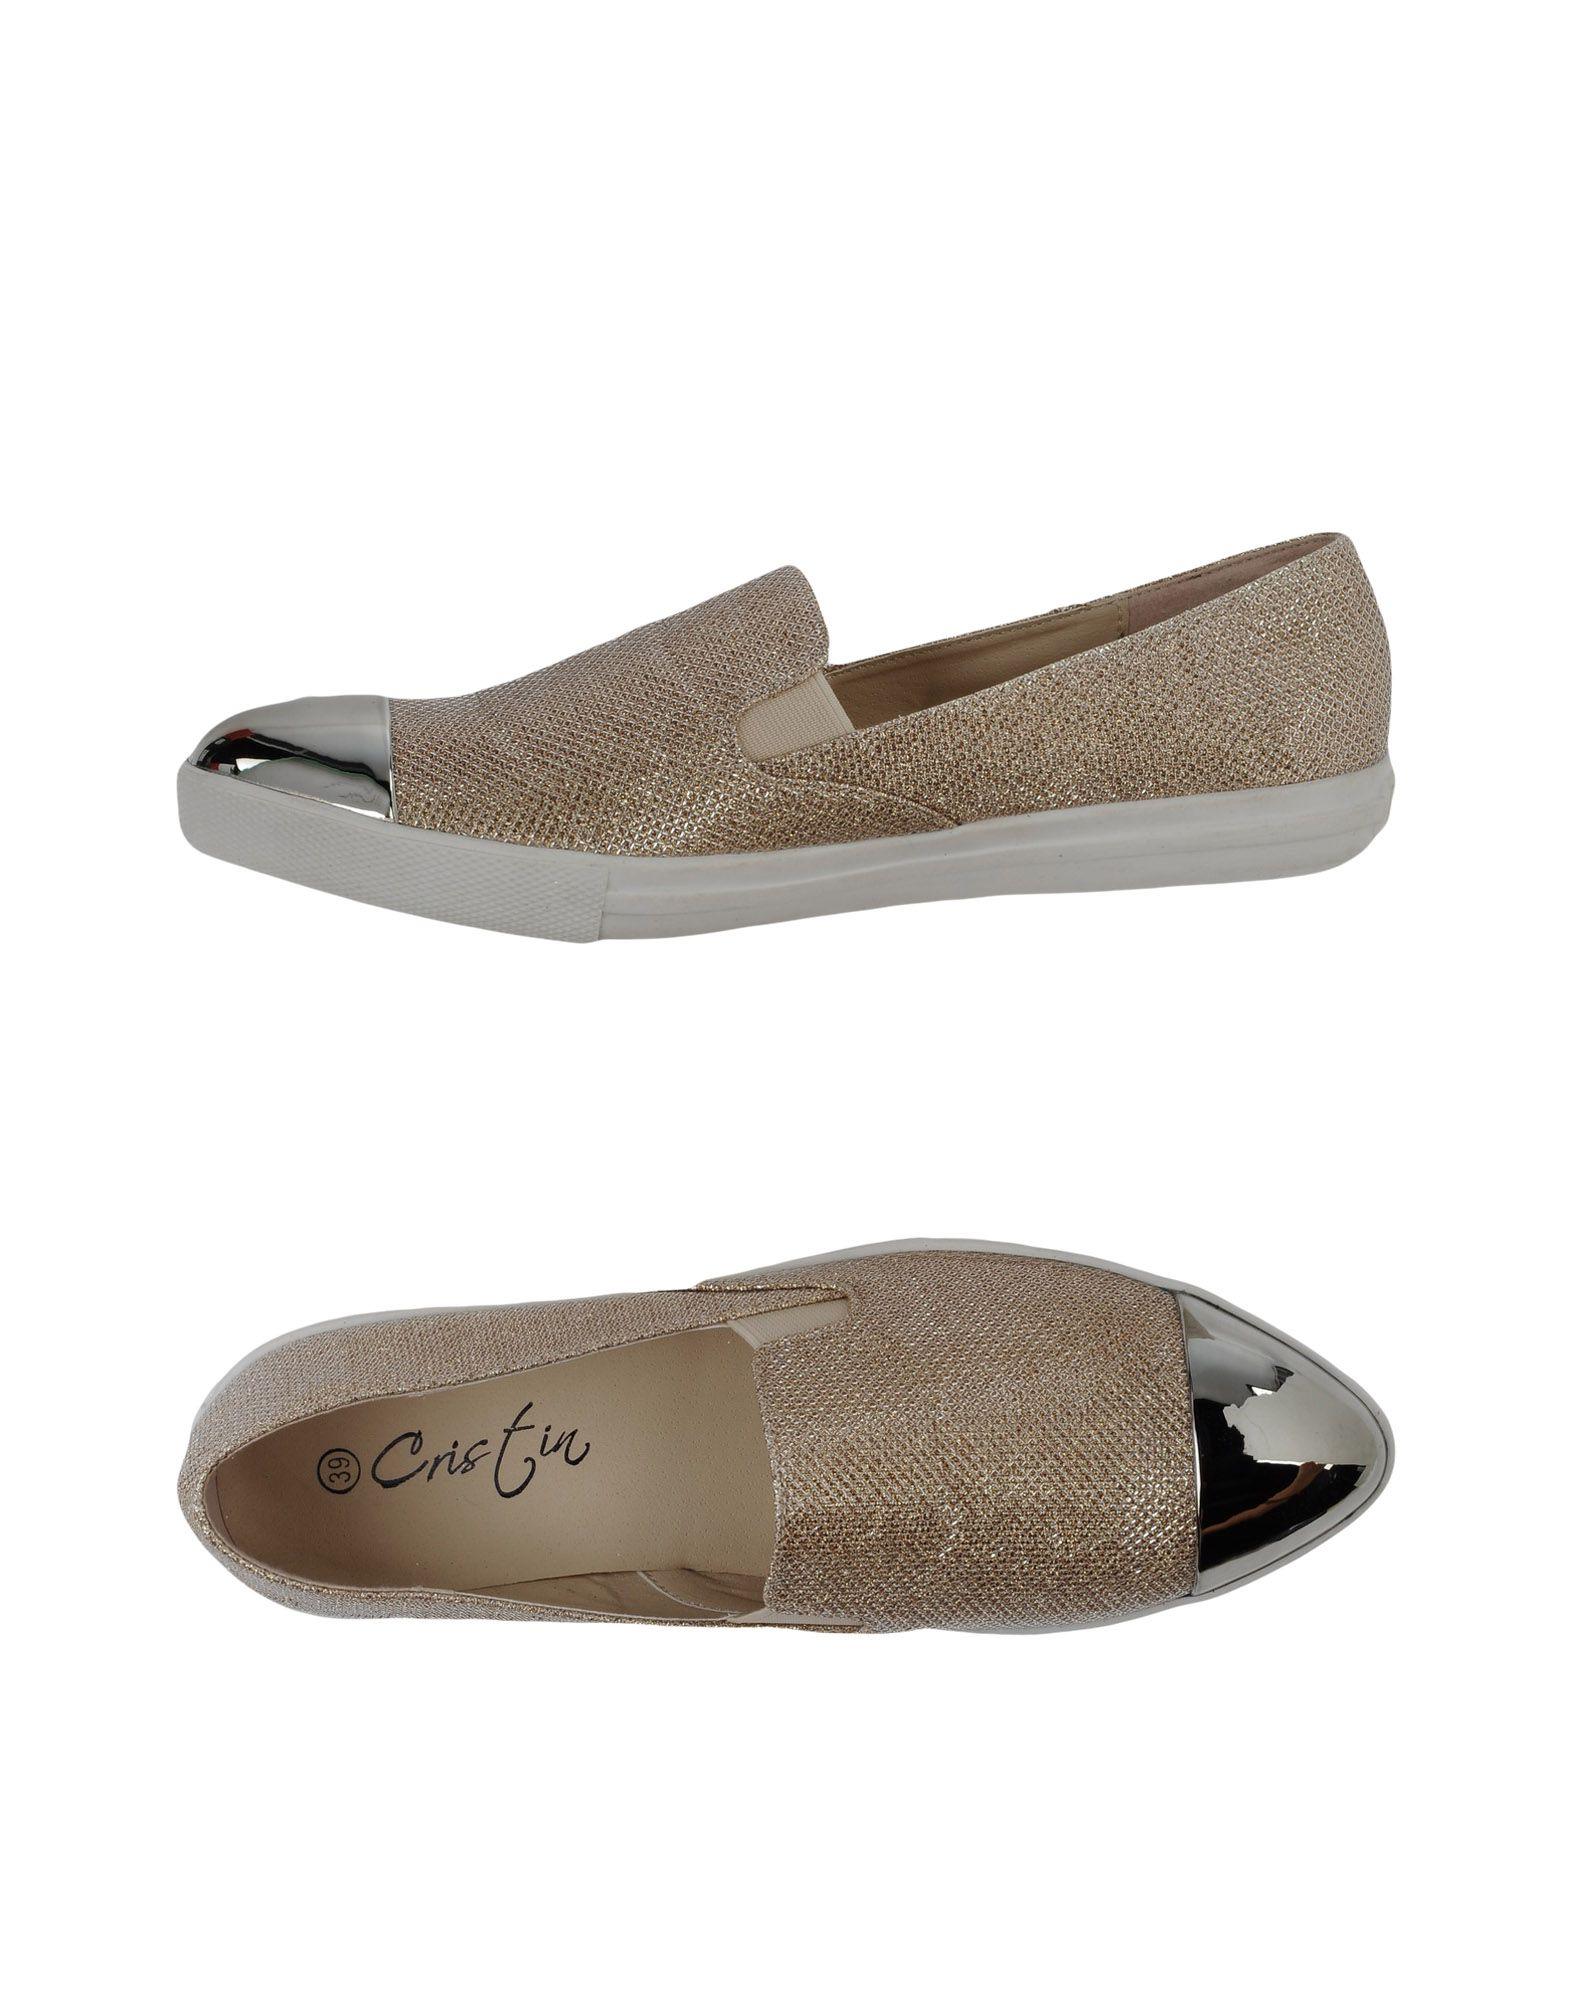 Sneakers Cristin Femme - Sneakers Cristin sur